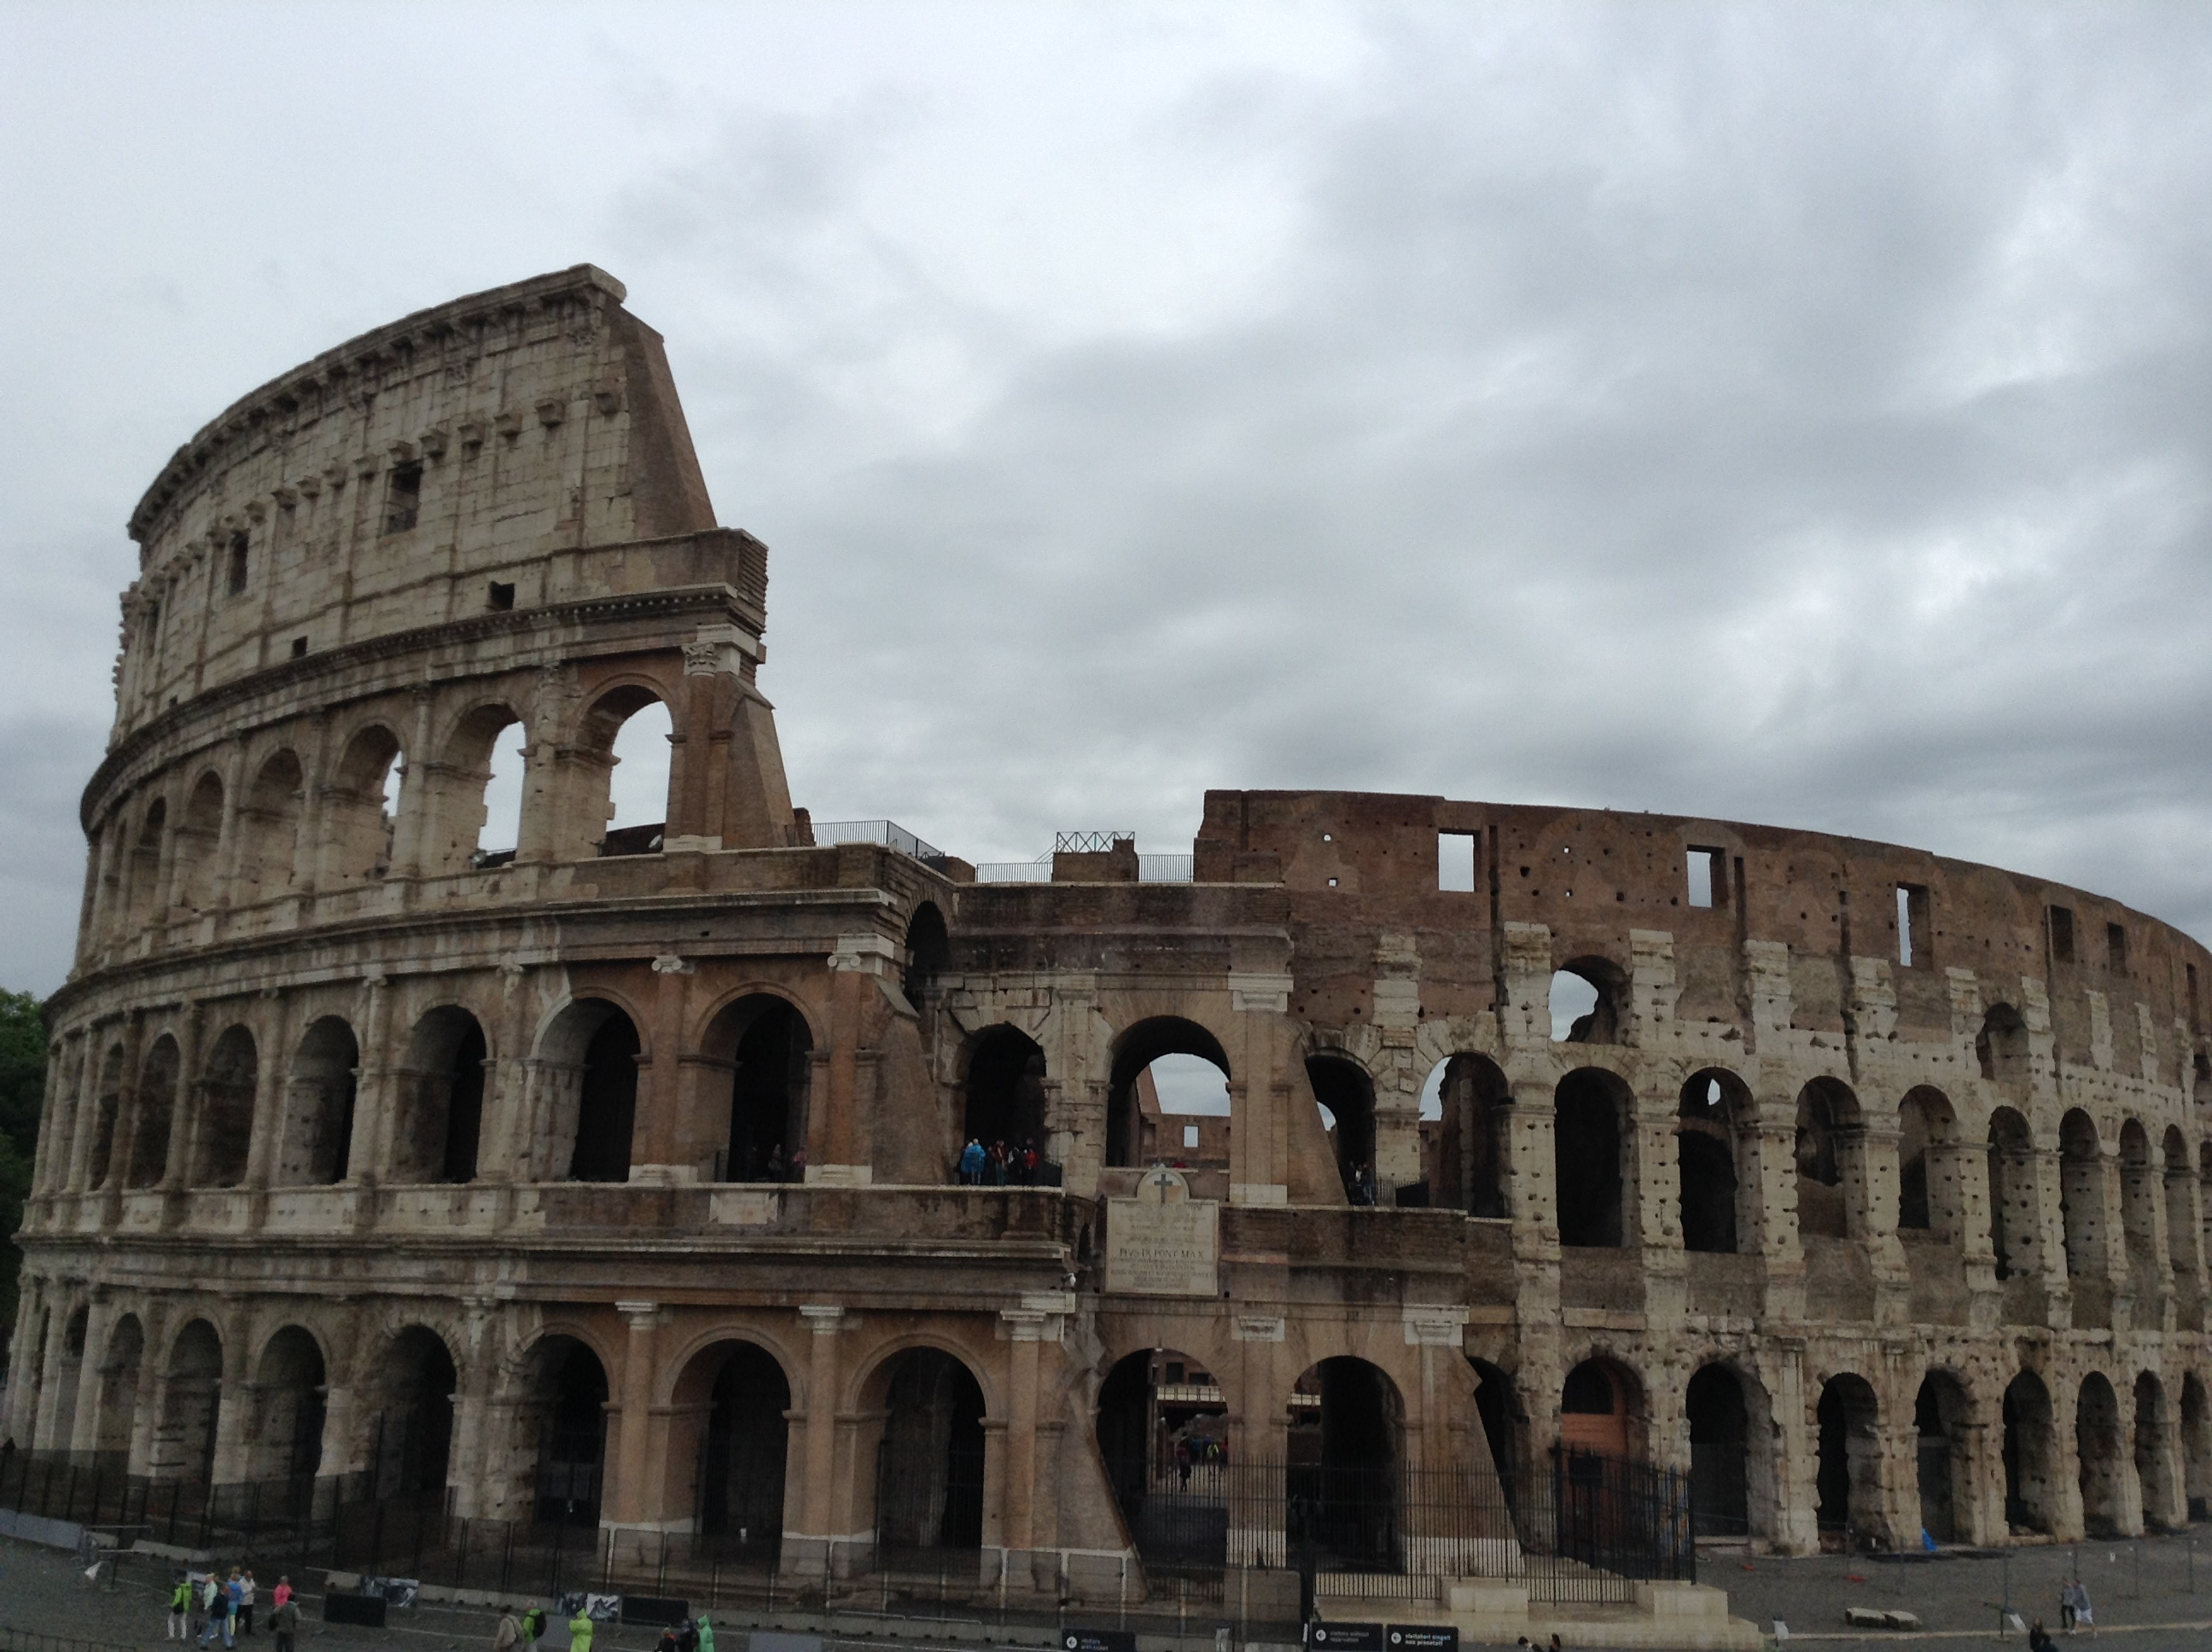 Italy, Herculaneum, Pompeii, Rome, Colosseum, Amalfi Coast, Naples